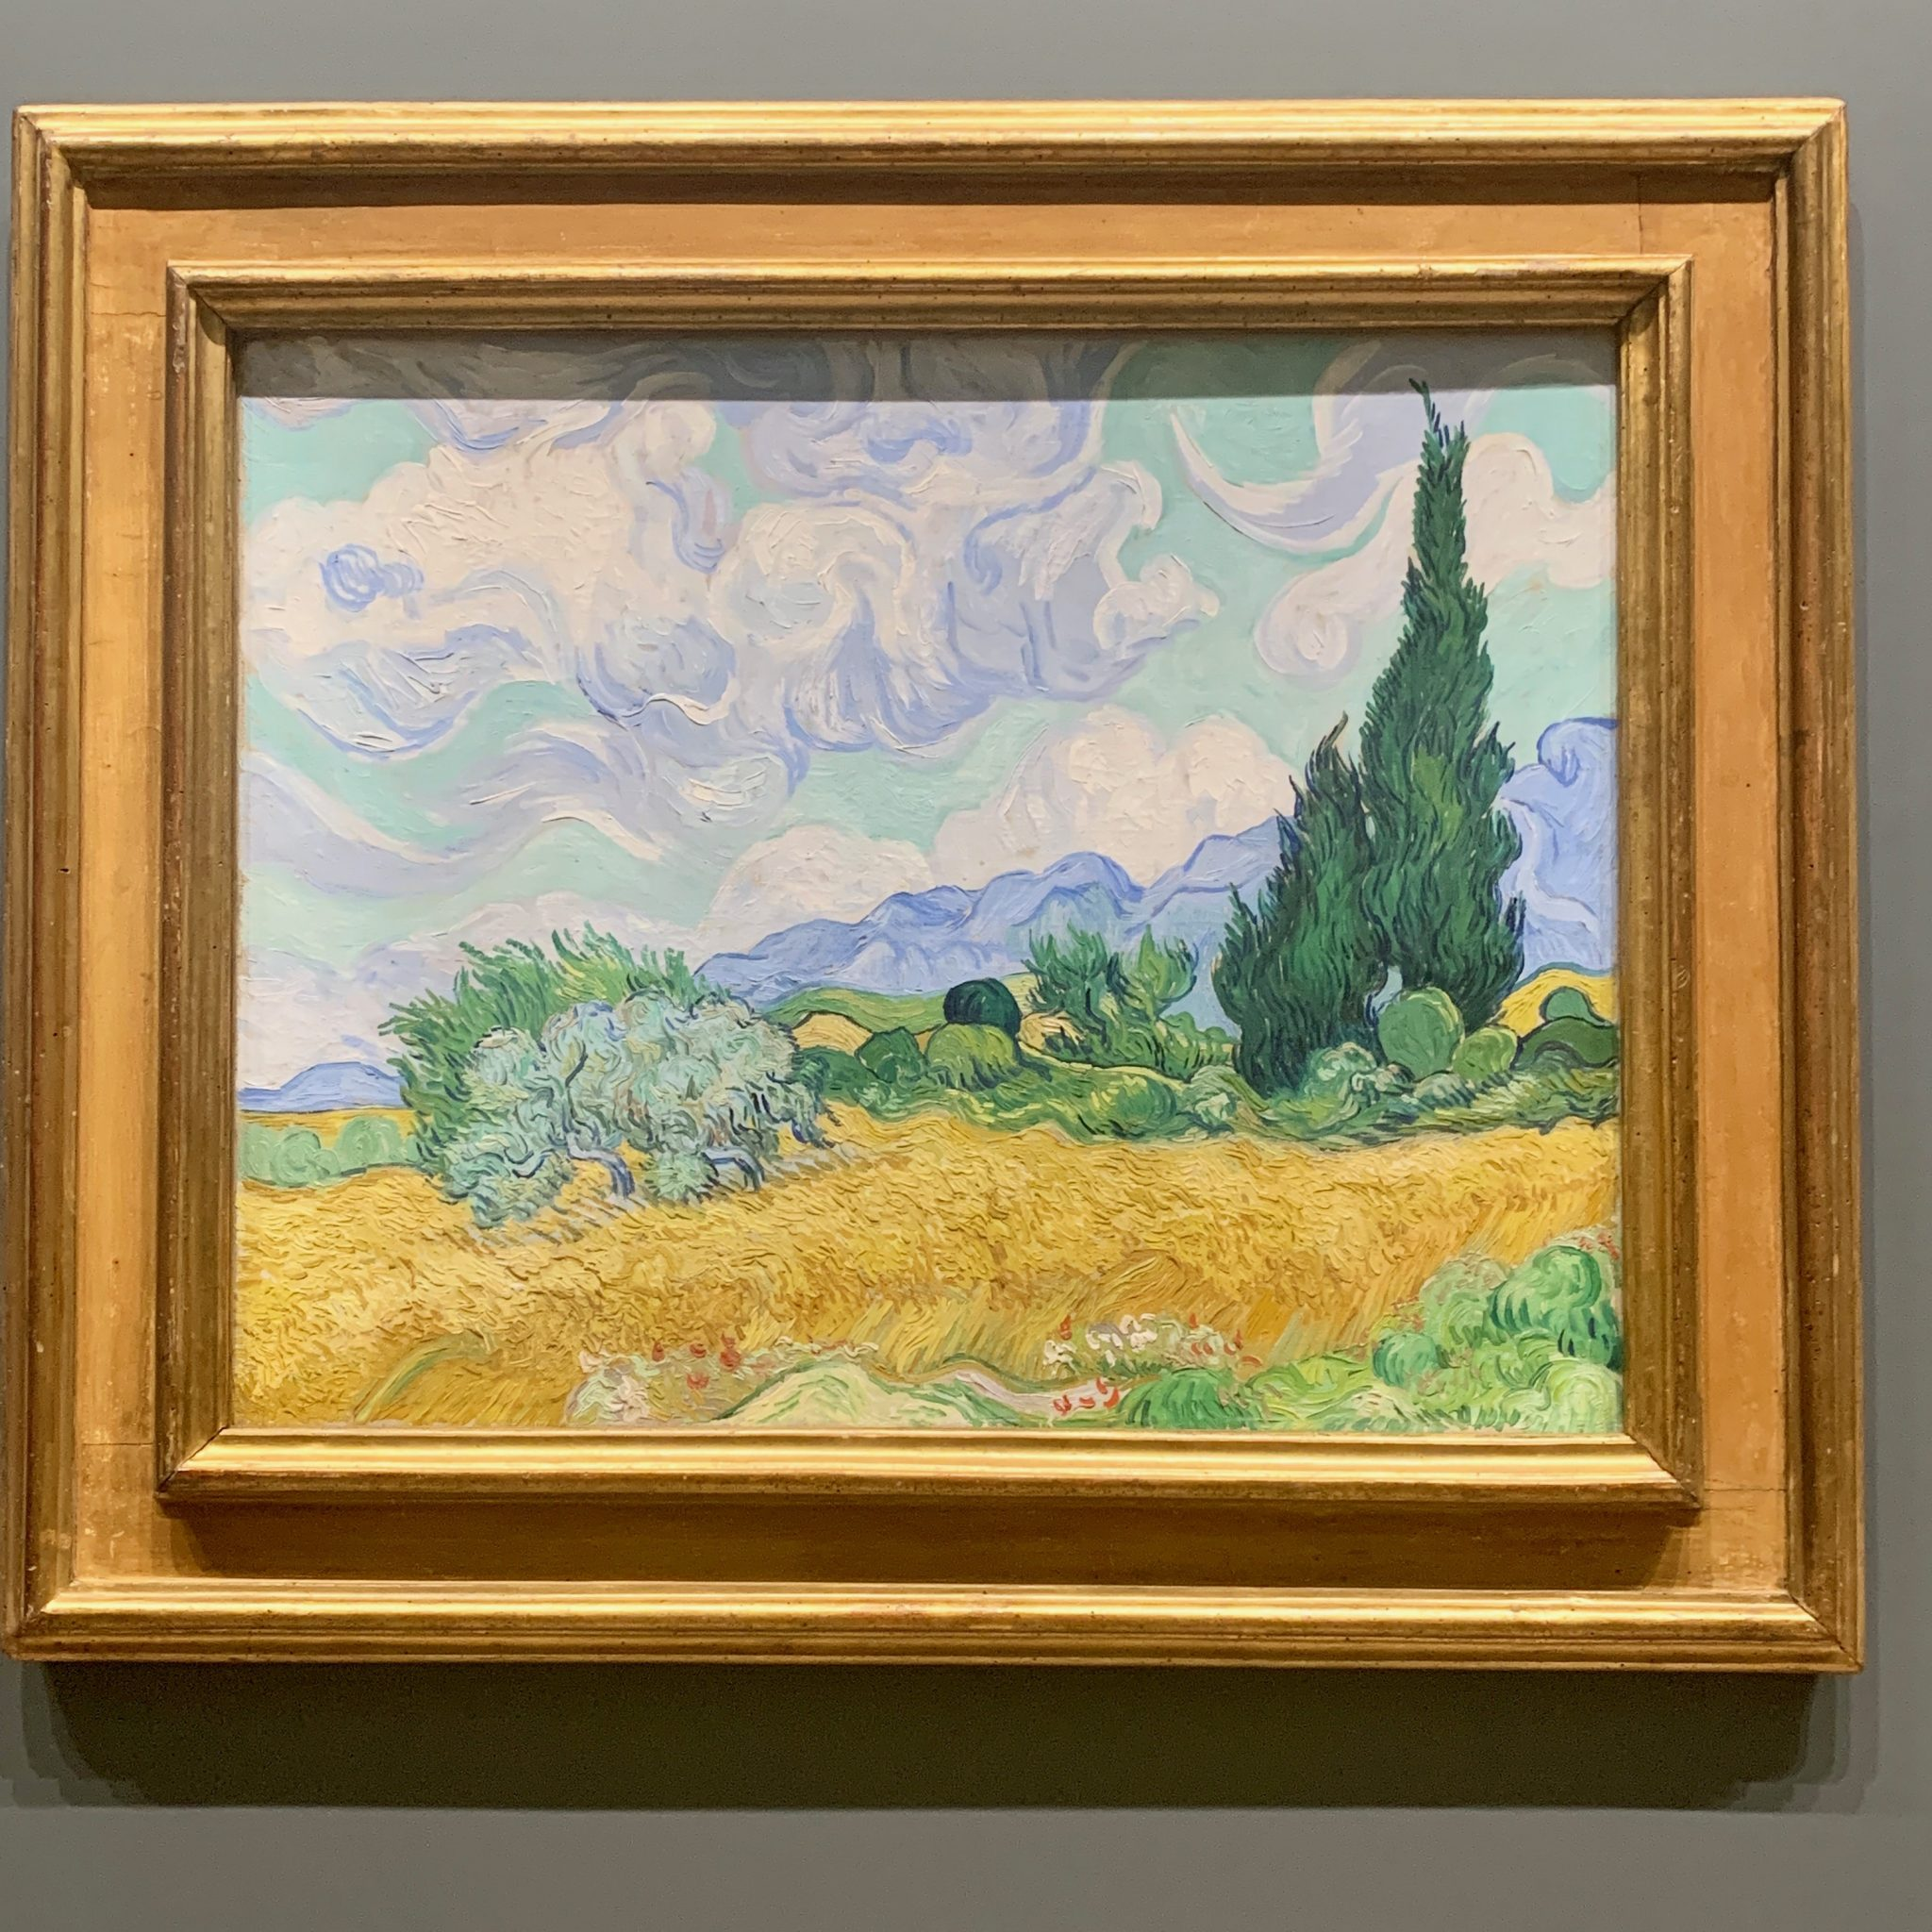 van gogh in the national gallery